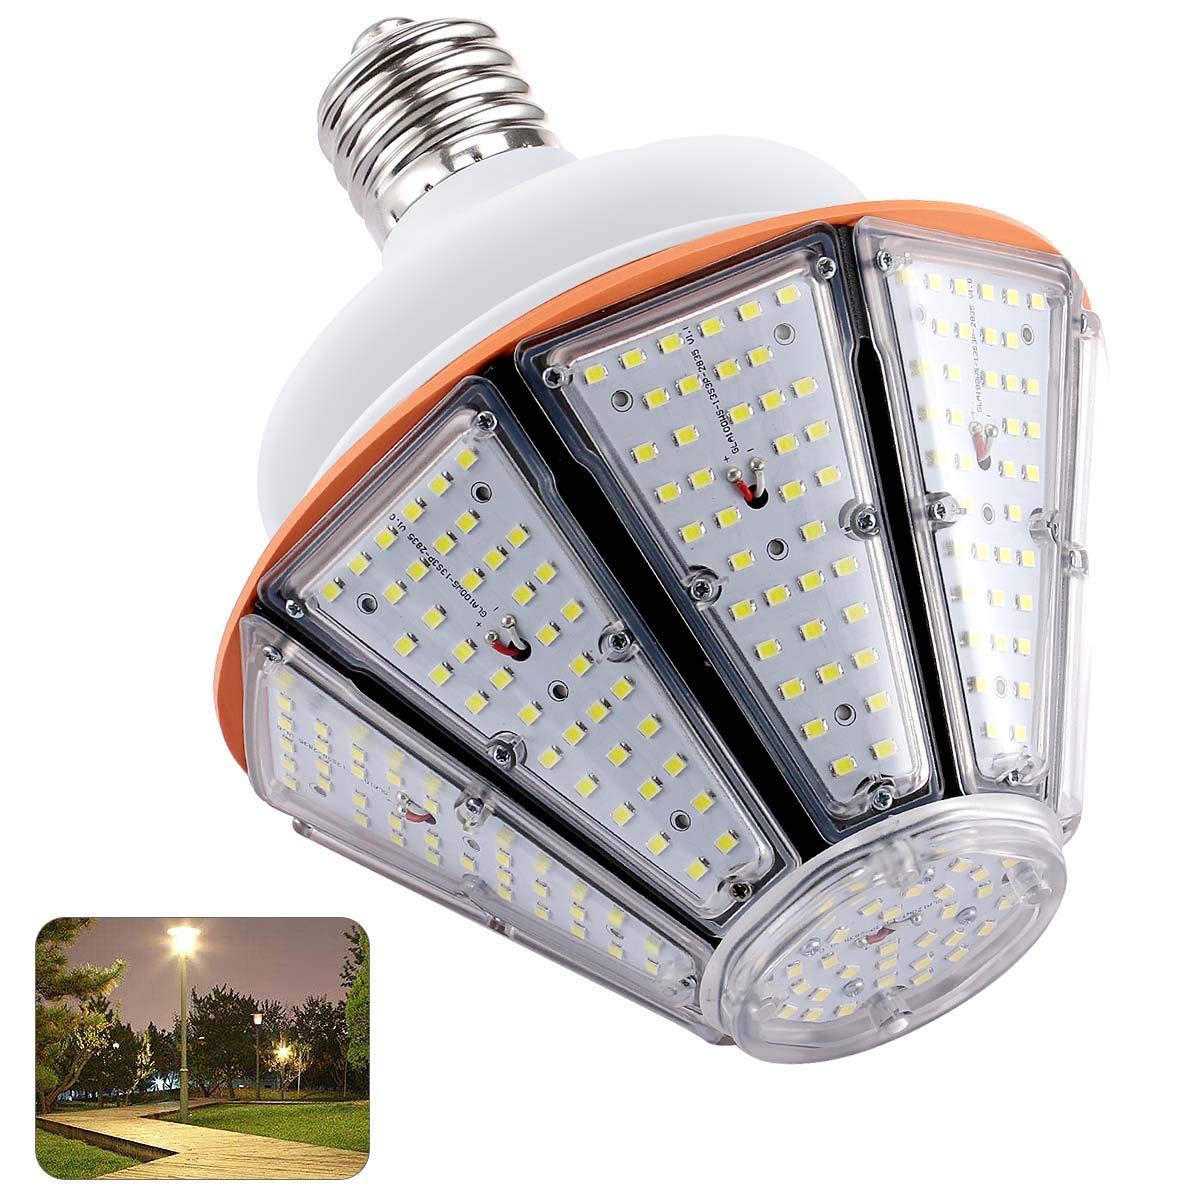 Led Corn Light Bulb 150W,6000K UL-Listed /& DLC Large Mogul E39 Base Replacement for 500W-600W Metal Halide//HID//CFL//HPS in Led Street Lighting High Bay Garage Lights Warehouse Lighting Ip65 Waterproof